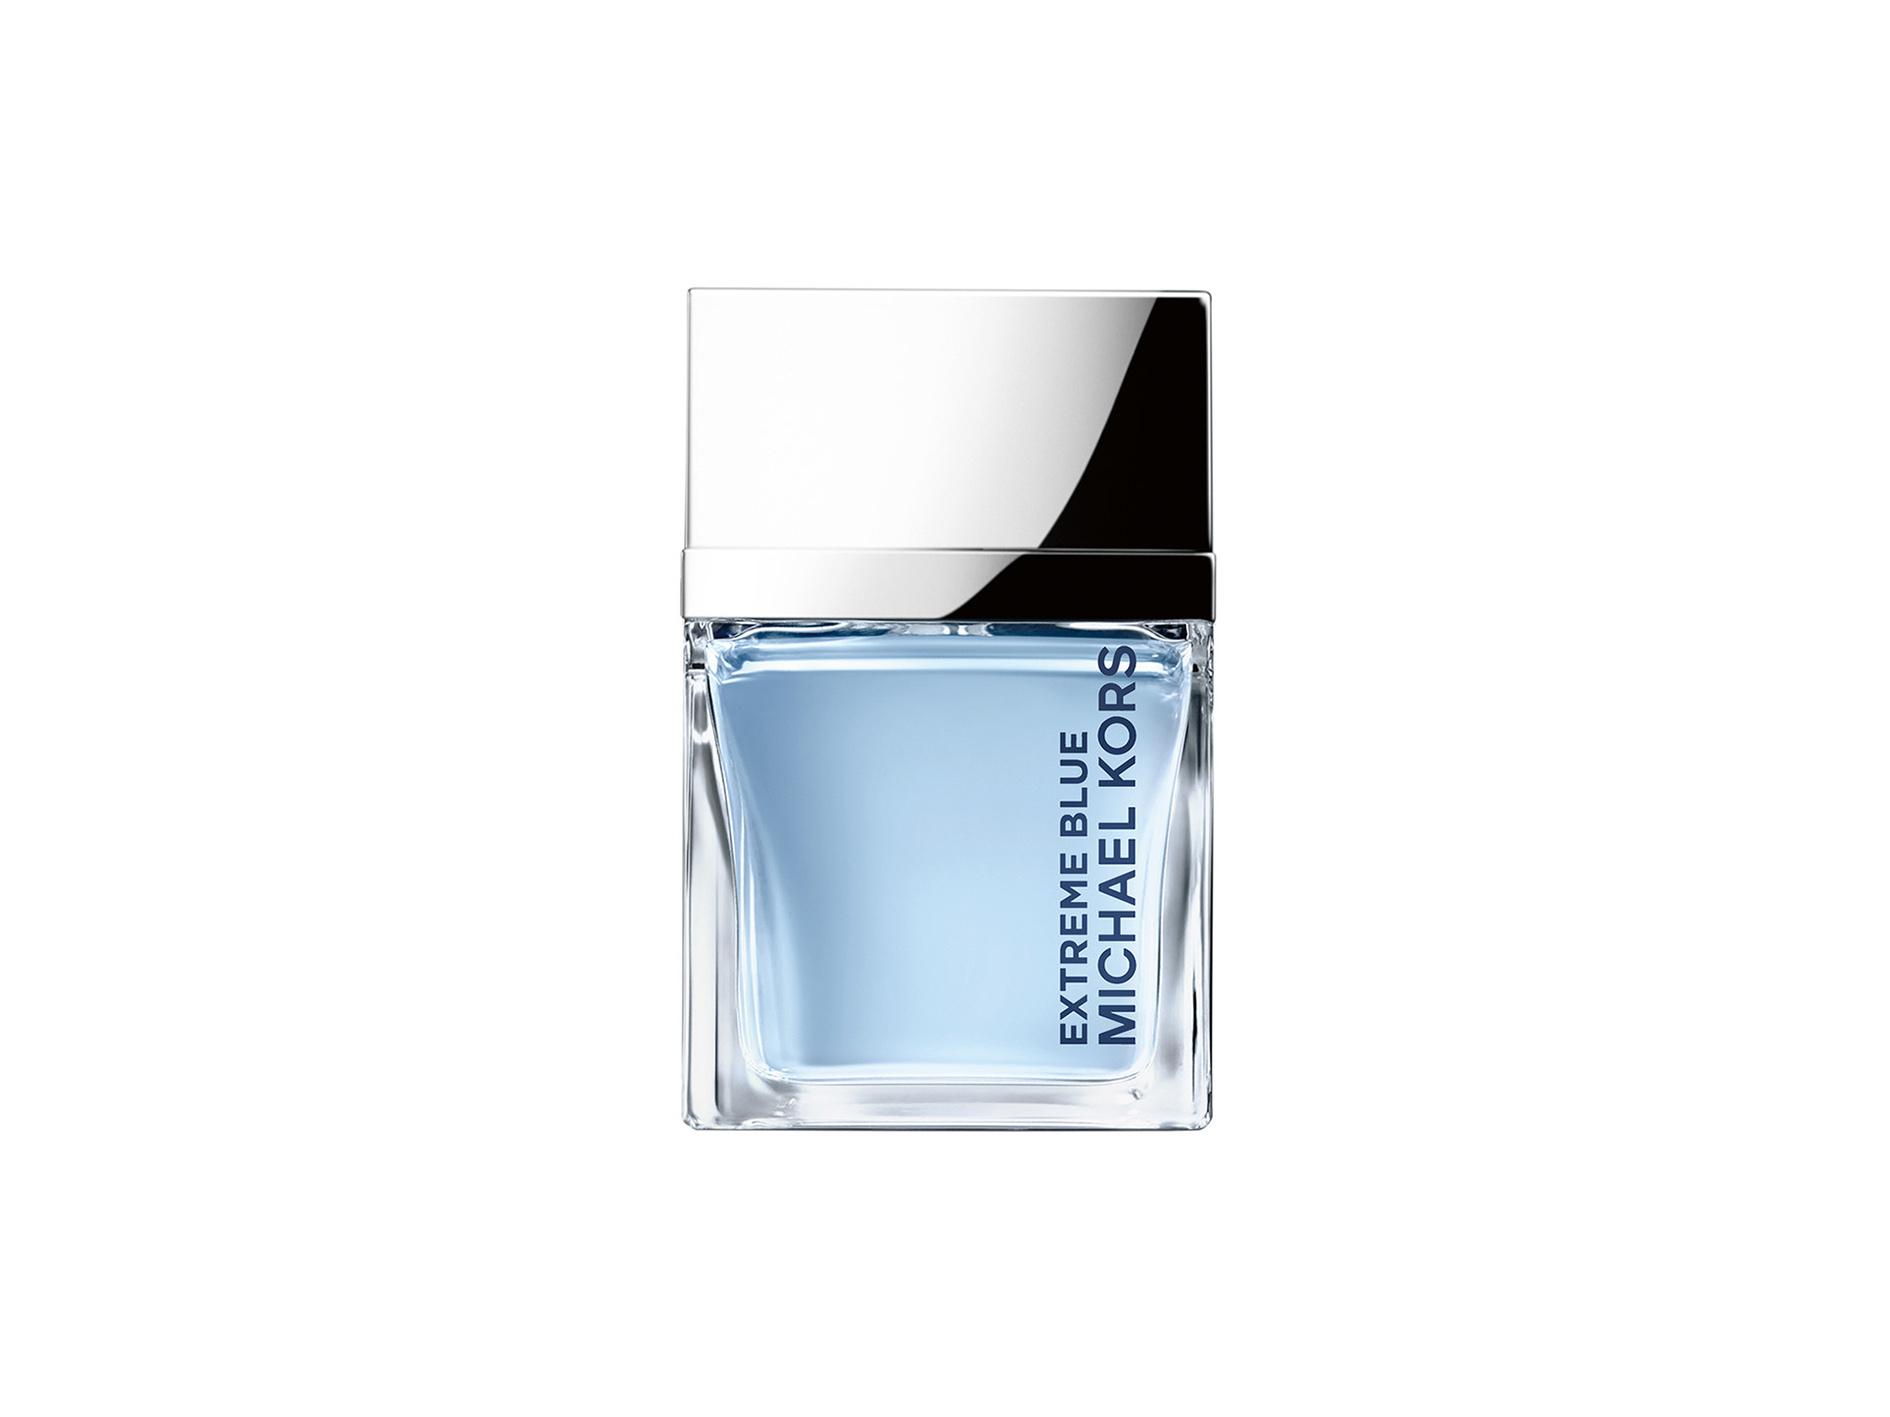 michael kors extreme blue perfume